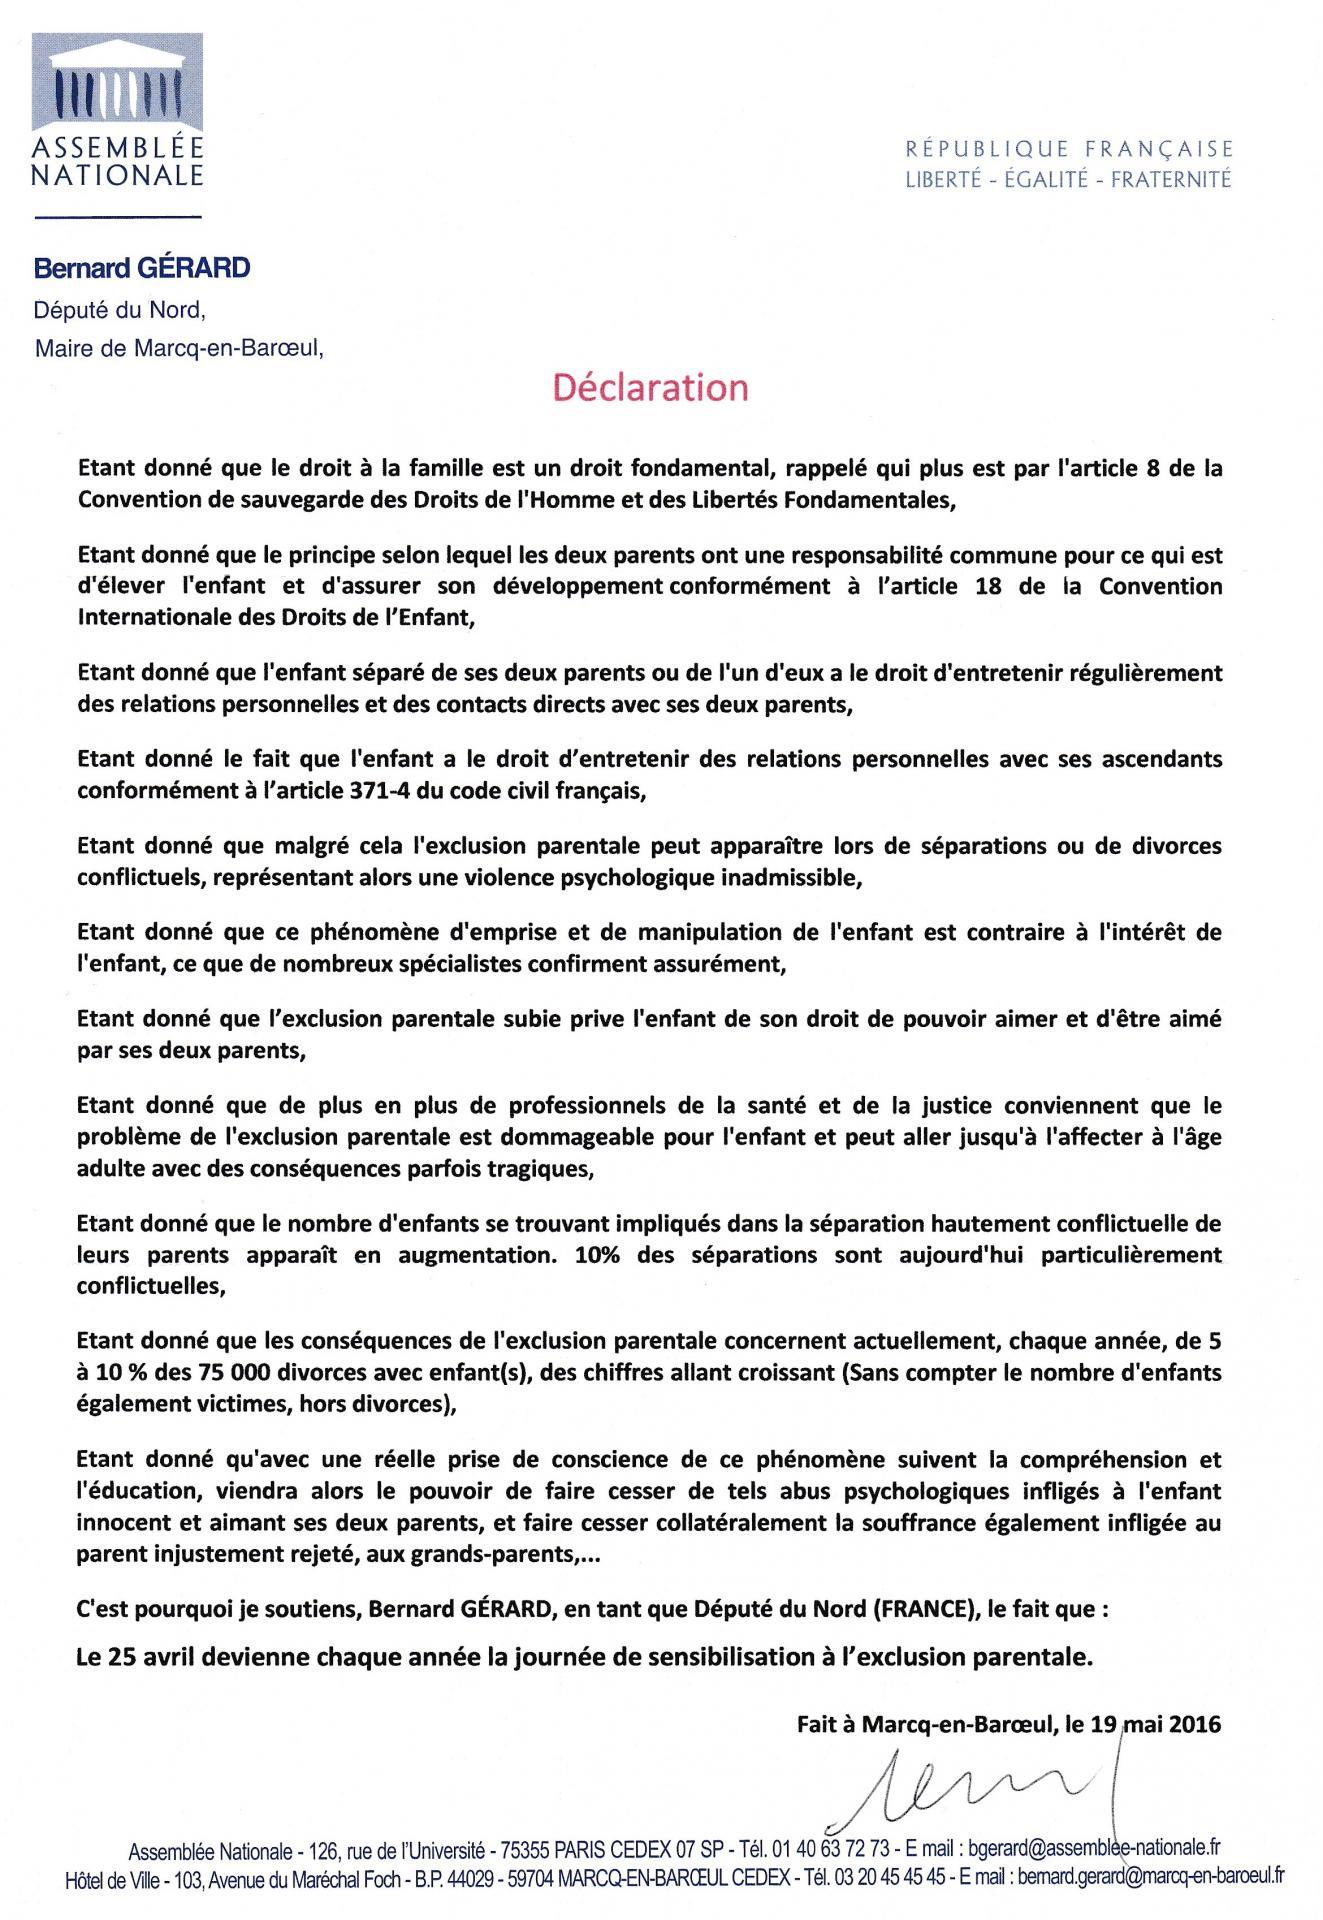 Declaration b gerard